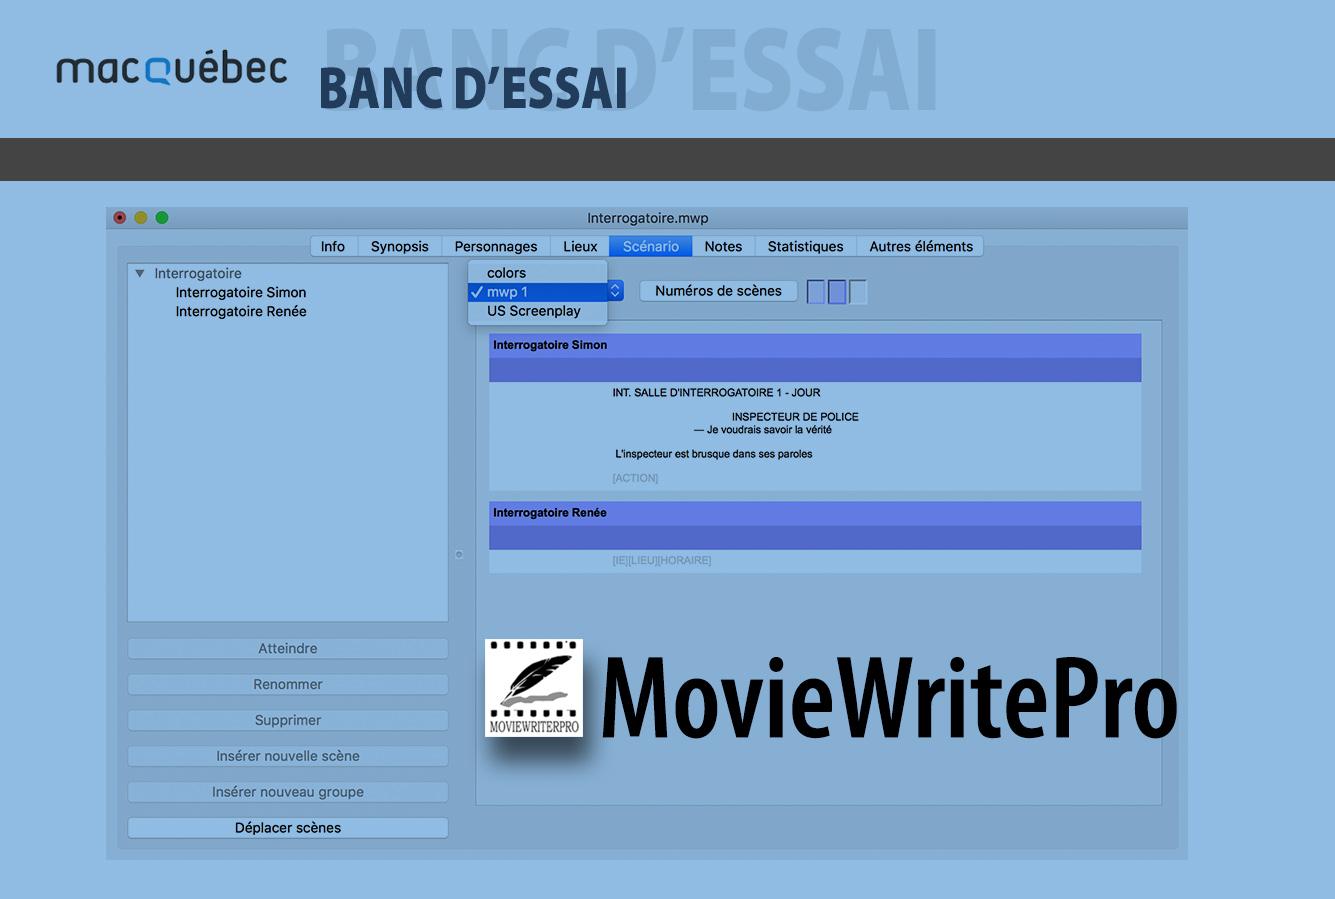 MovieWriterPro - illustration de l'article